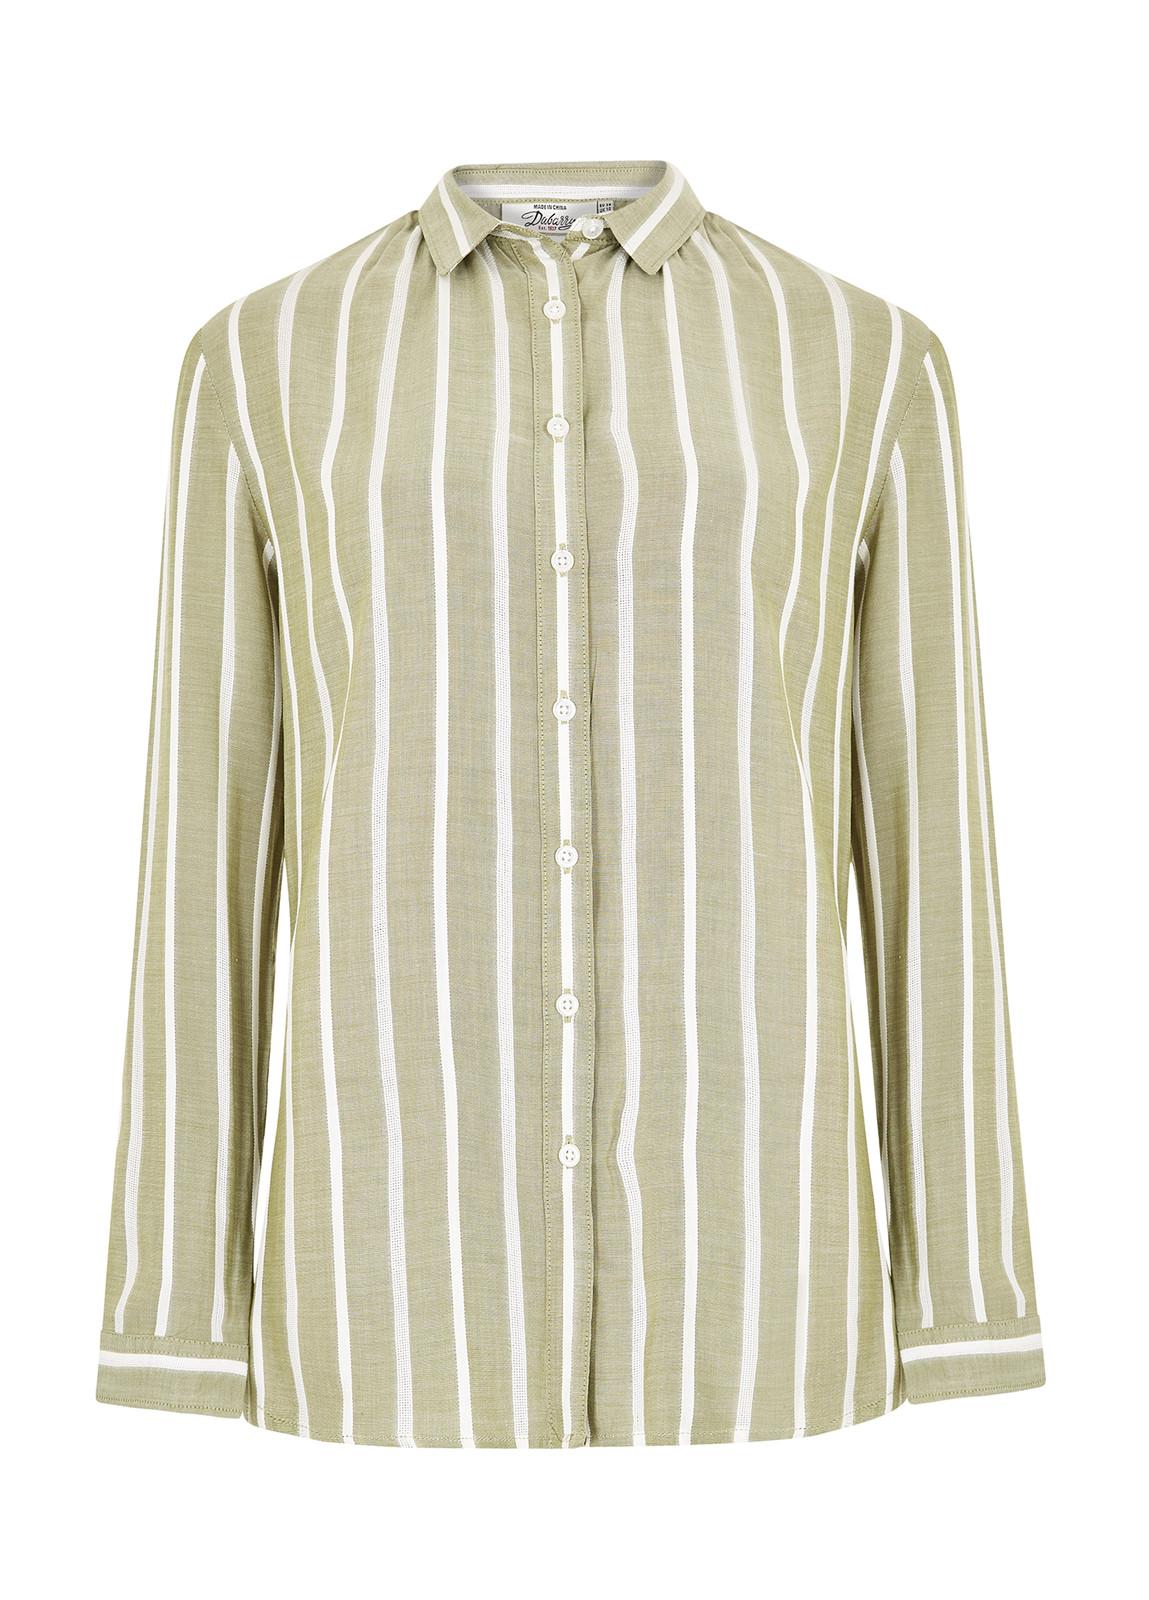 Dubarry_Violet Shirt - Tobacco_Image_2